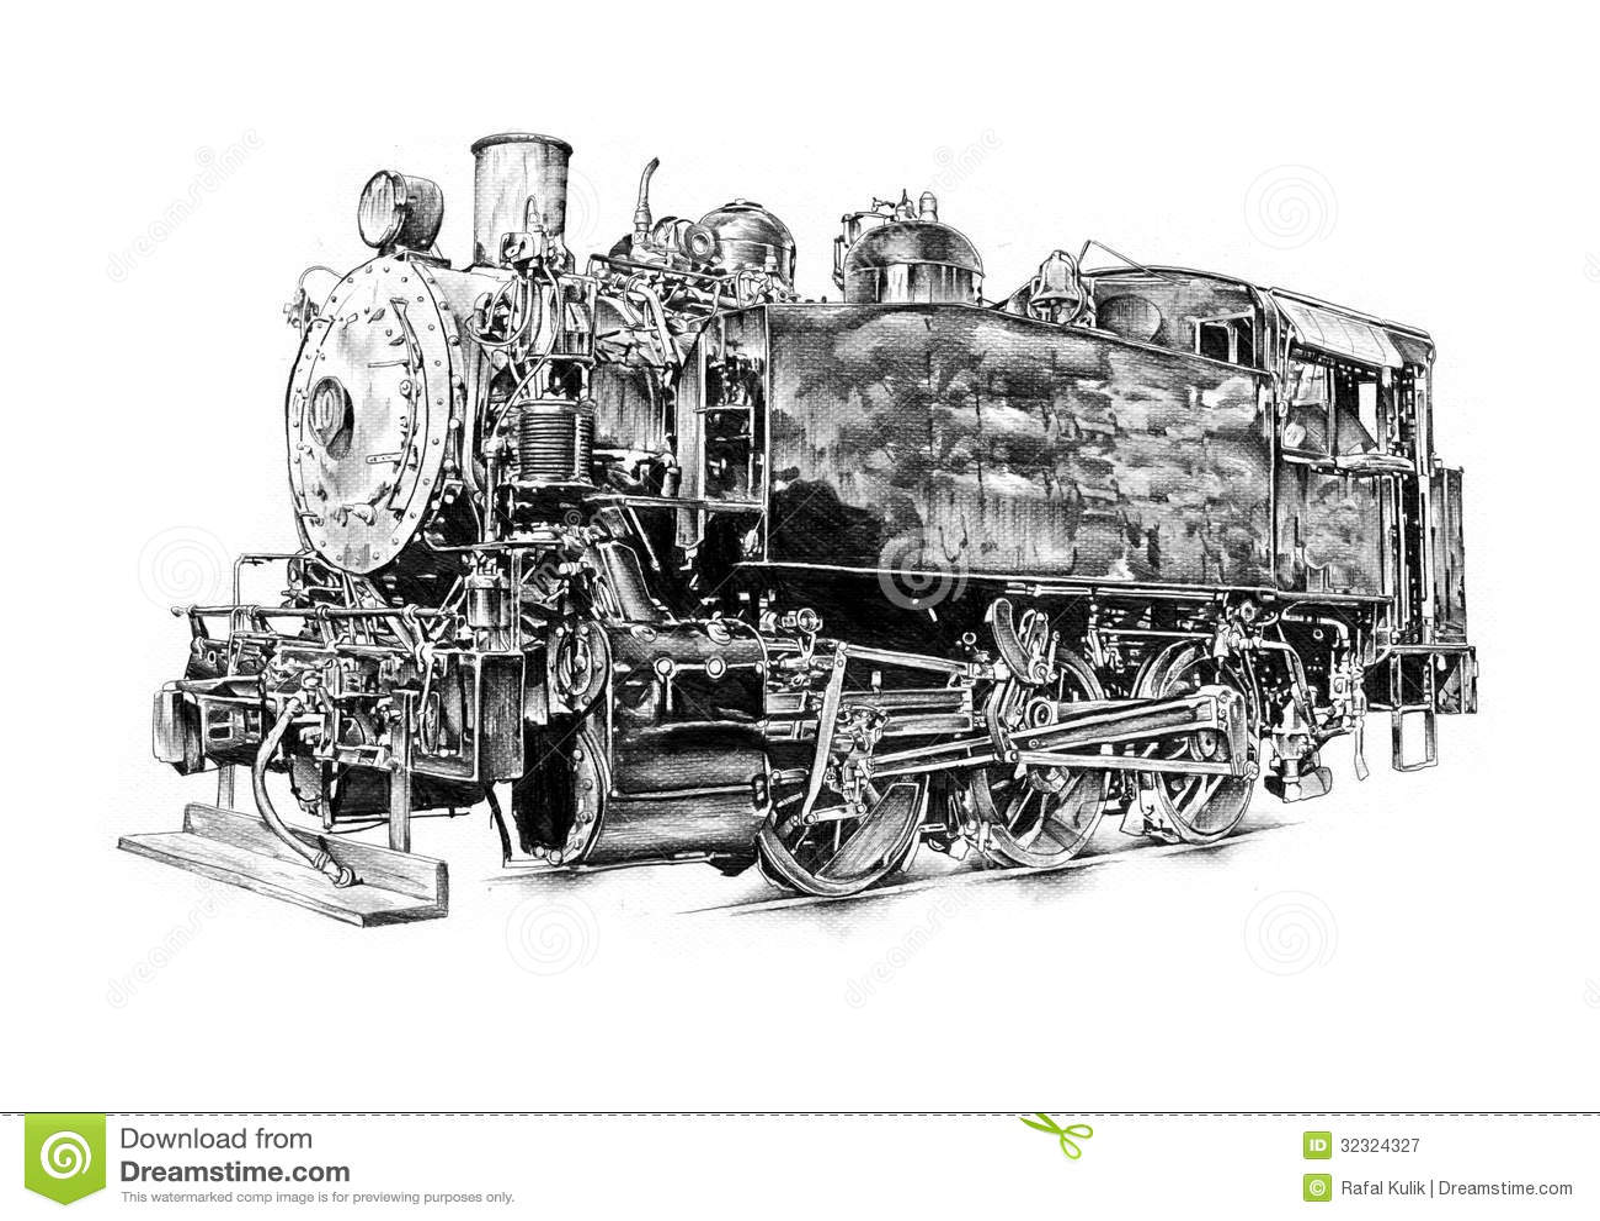 Art Design Drawing : Steam engine art design drawing stock illustration image